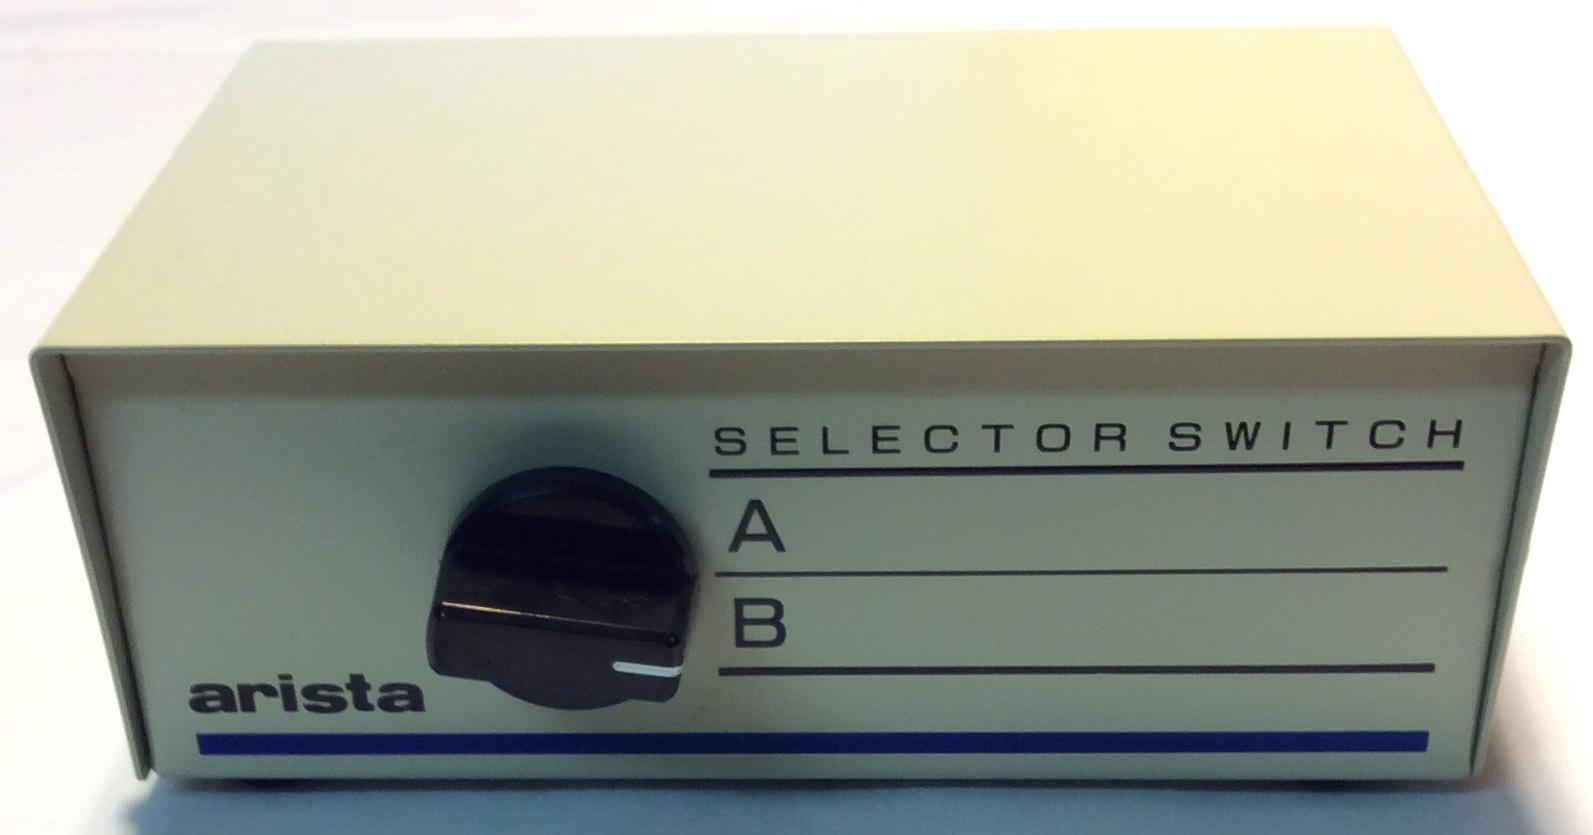 Arista Grey metal 2 channel selector